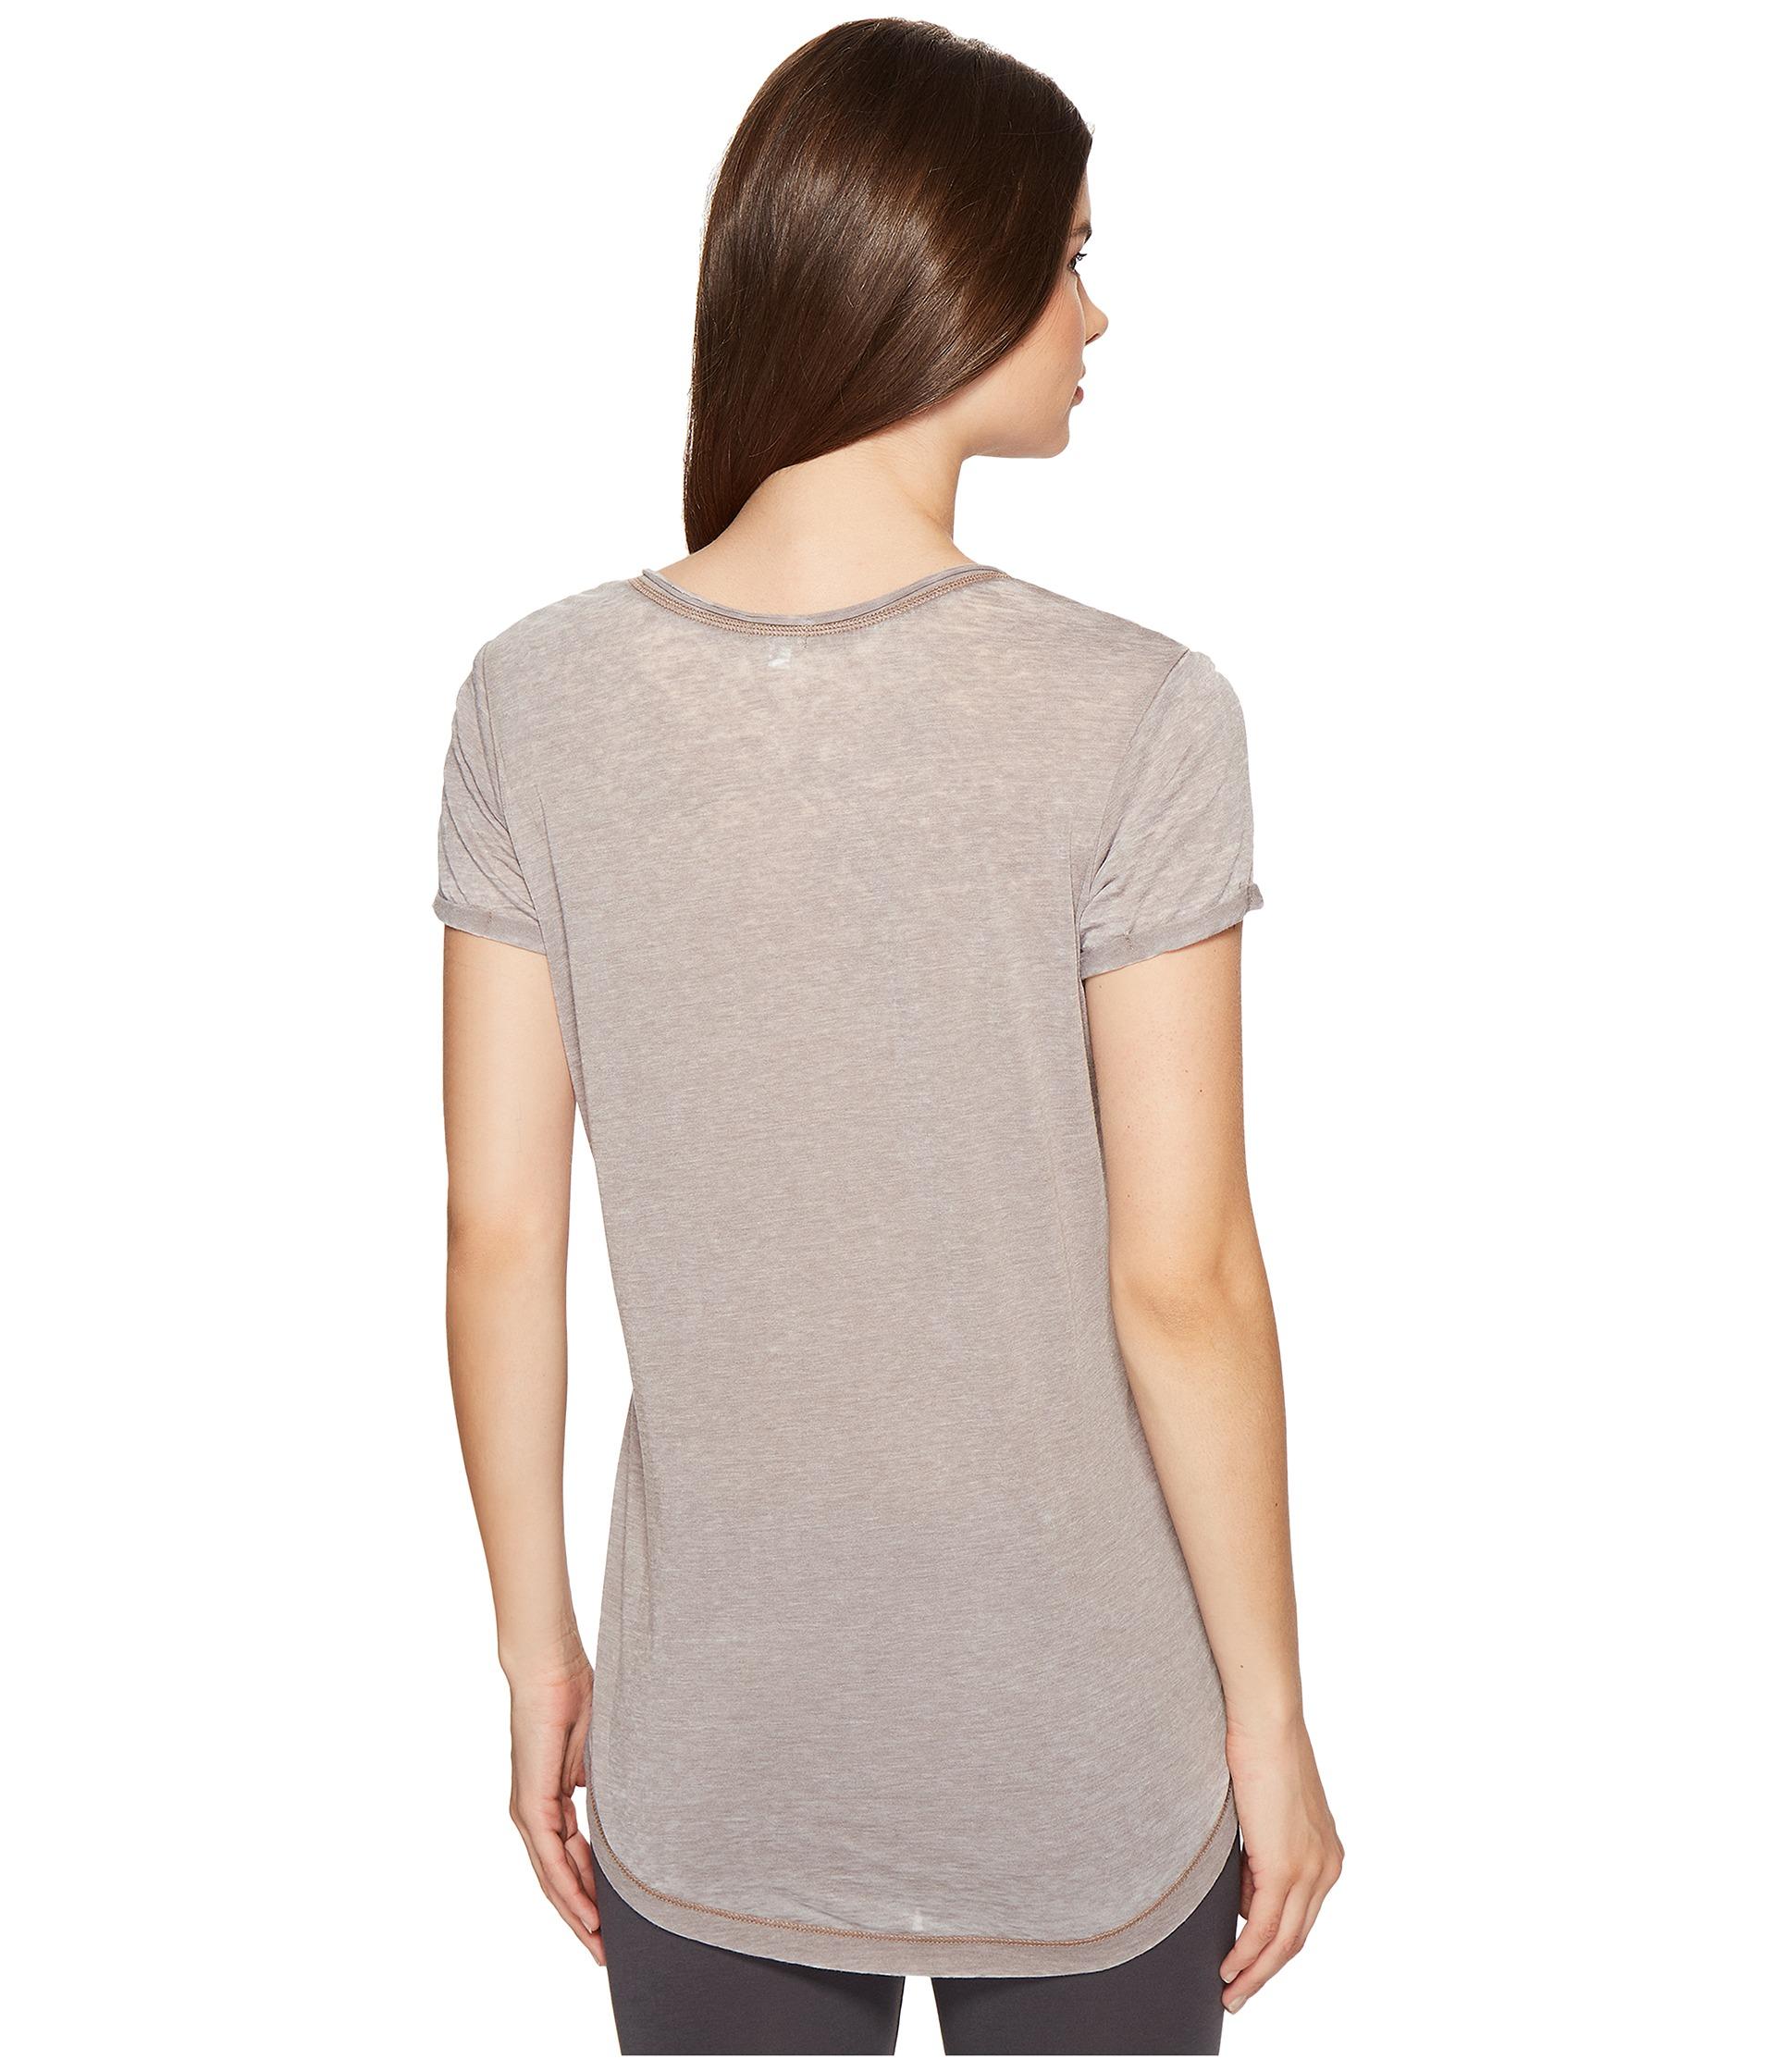 P J Salvage Burnout T Shirt at Zappos